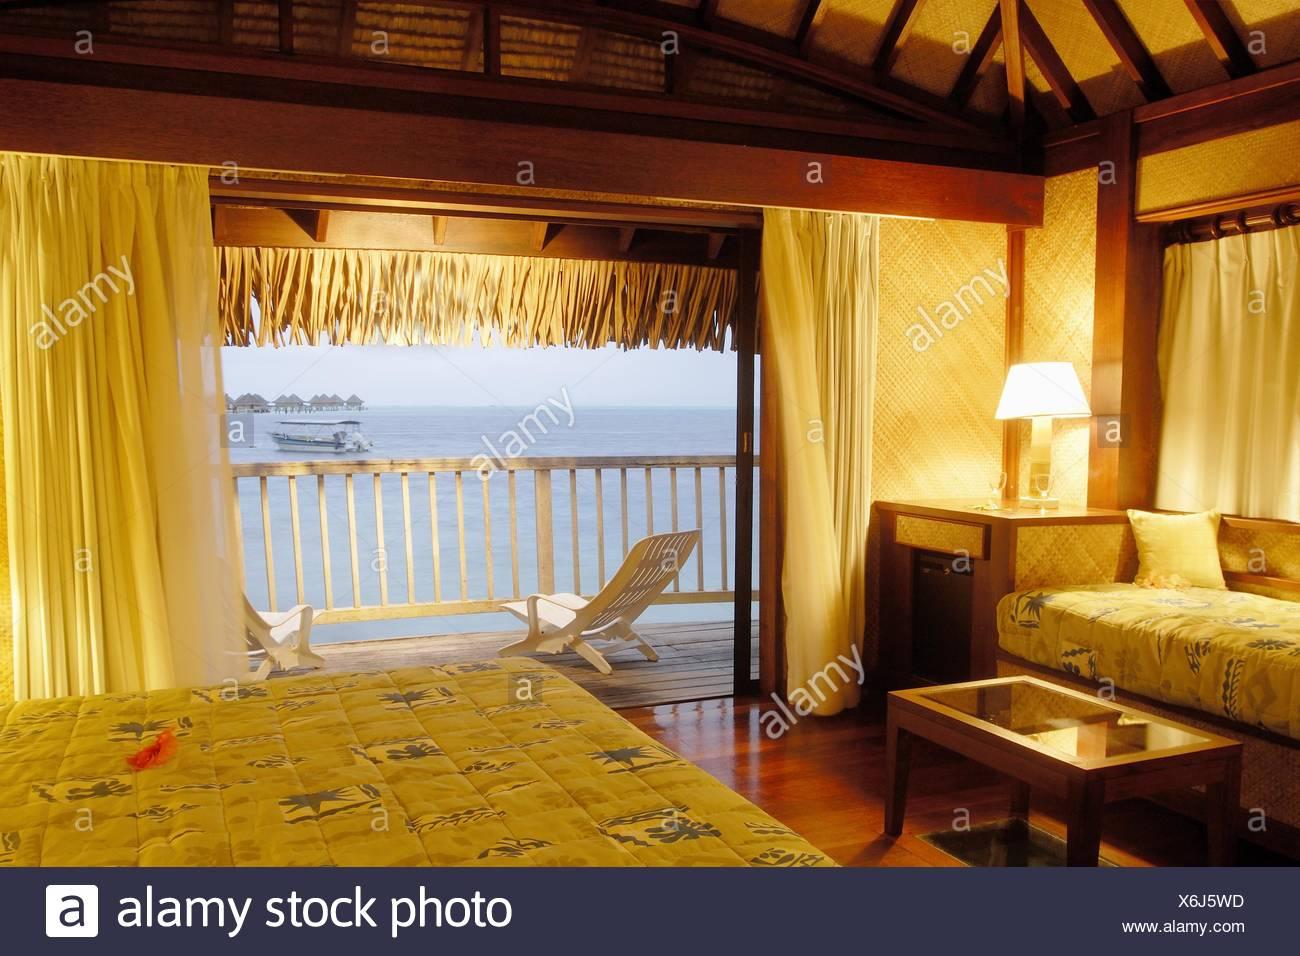 Interieur de bungalow,hotel Maitai Polinesia,Bora-Bora,iles de la Societe,archipel de la Polynesie francaise,ocean Pacifique sud. Foto de stock